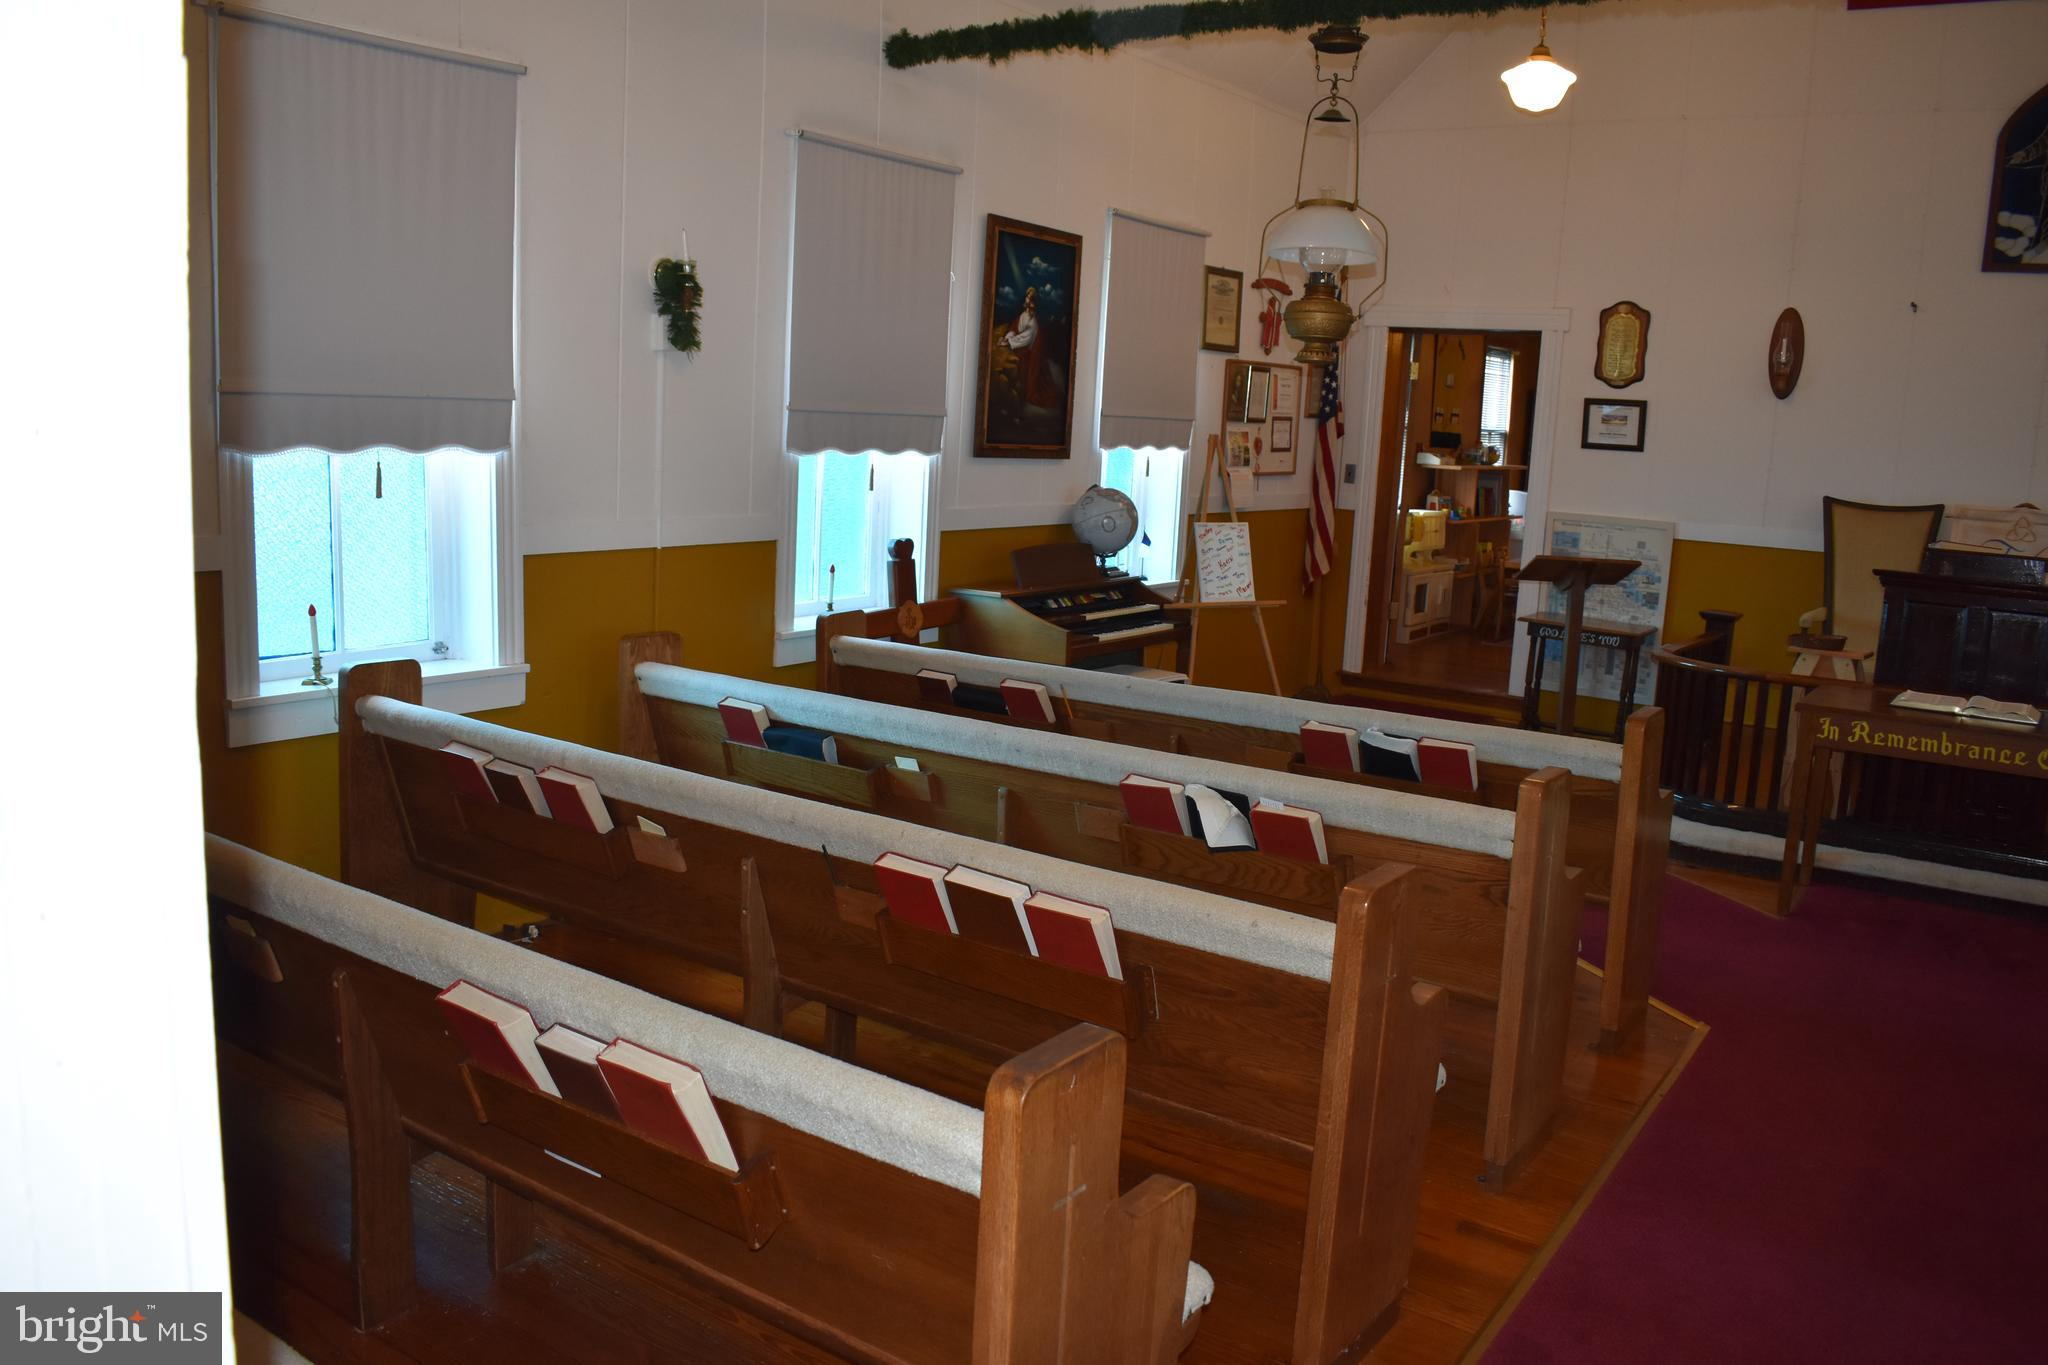 165 SALEM CHURCH, Martinsburg, WV 25401 Martinsburg WV - WVBE169126 ...